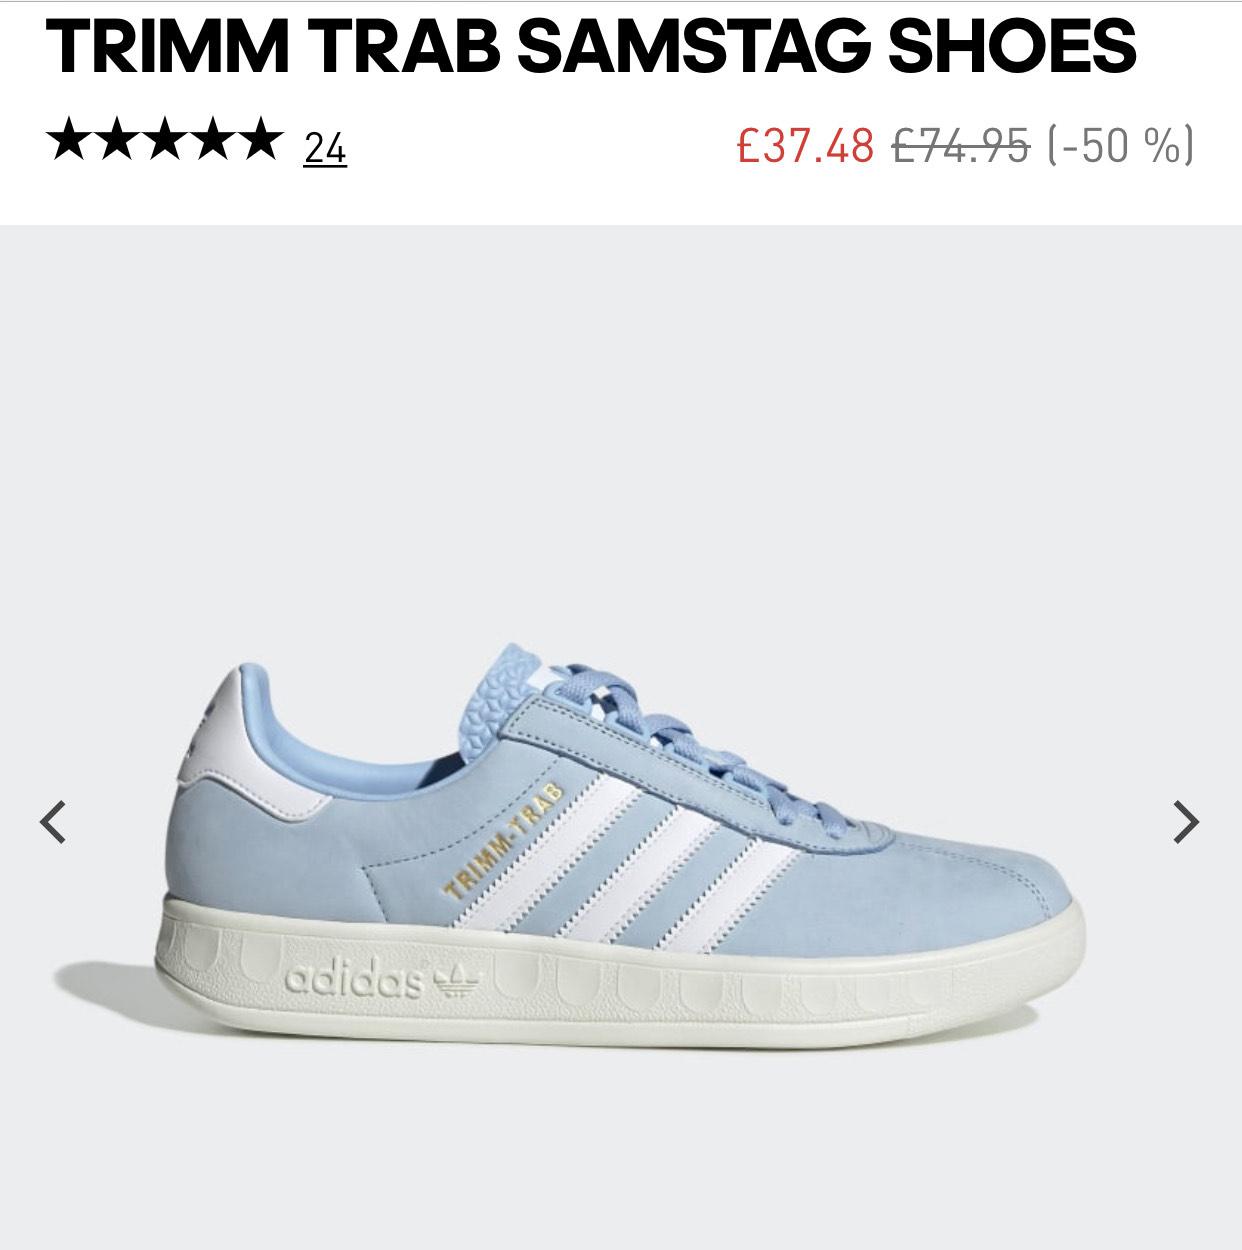 Adidas Trimm Trab samstag uk7.5-13 £33.97 @ adidas